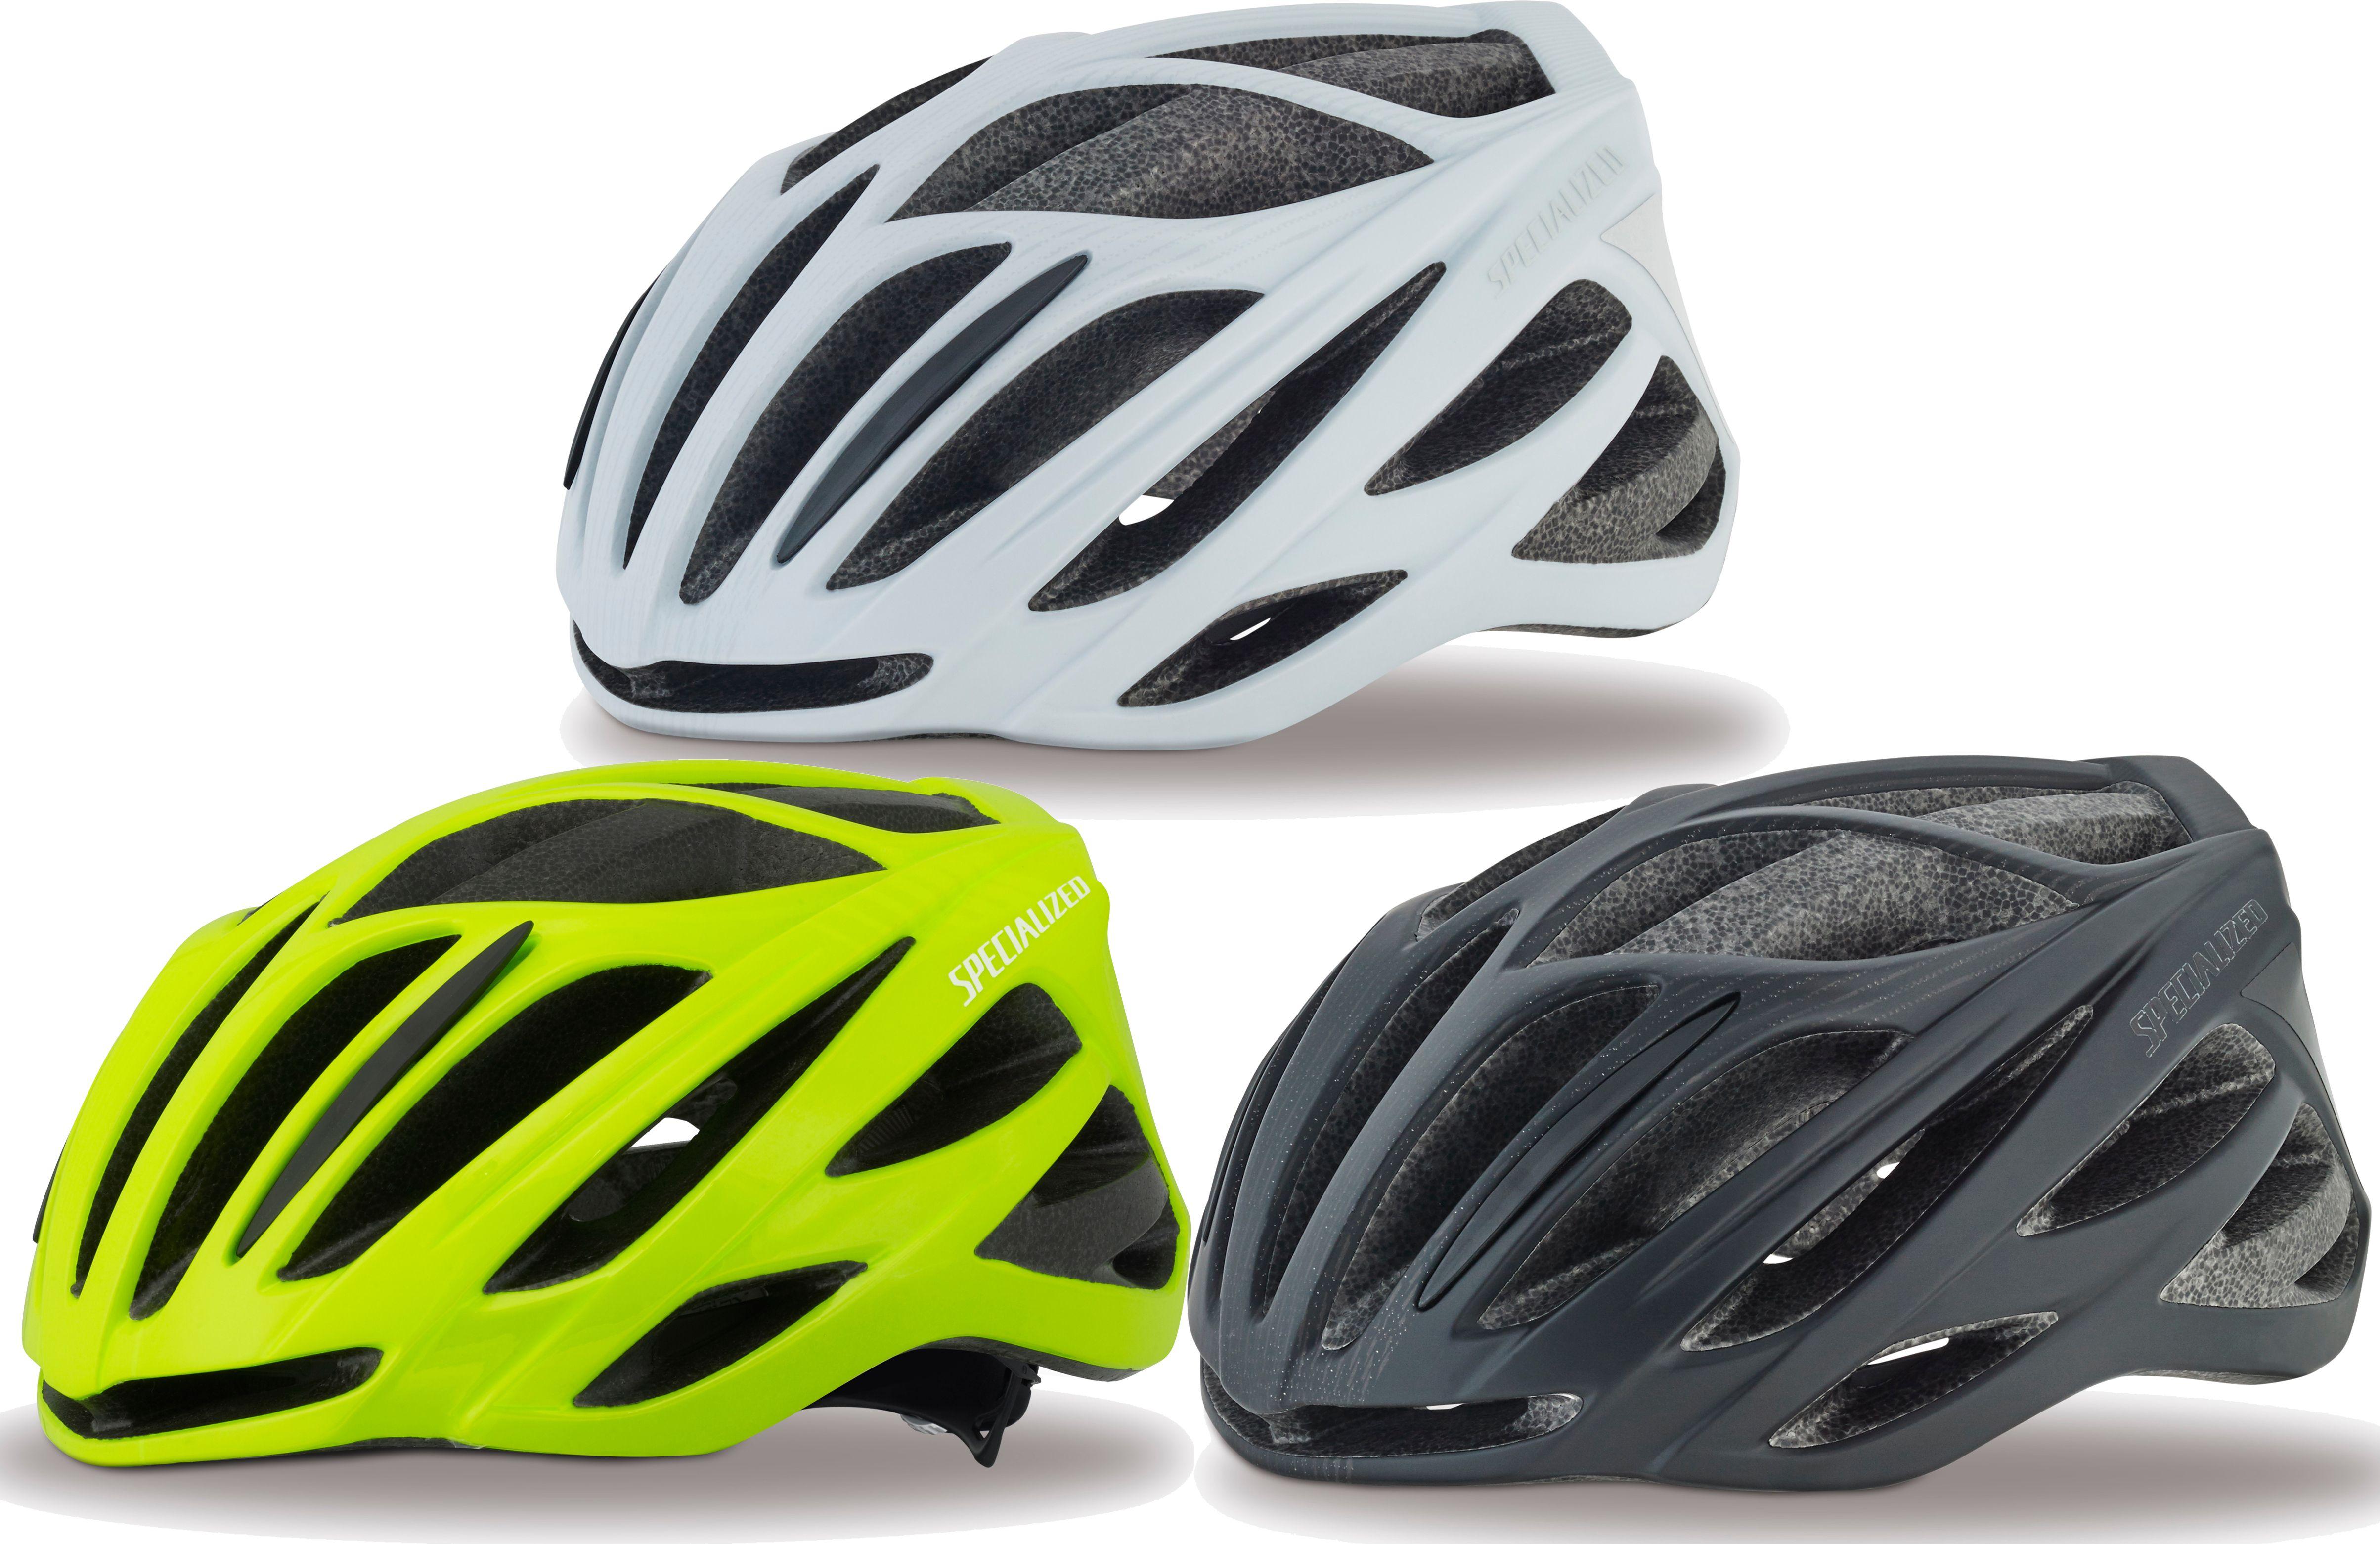 sale online best sell sports shoes Specialized Echelon 2 Helmet - £44.99 | Helmets - Mens/Unisex ...